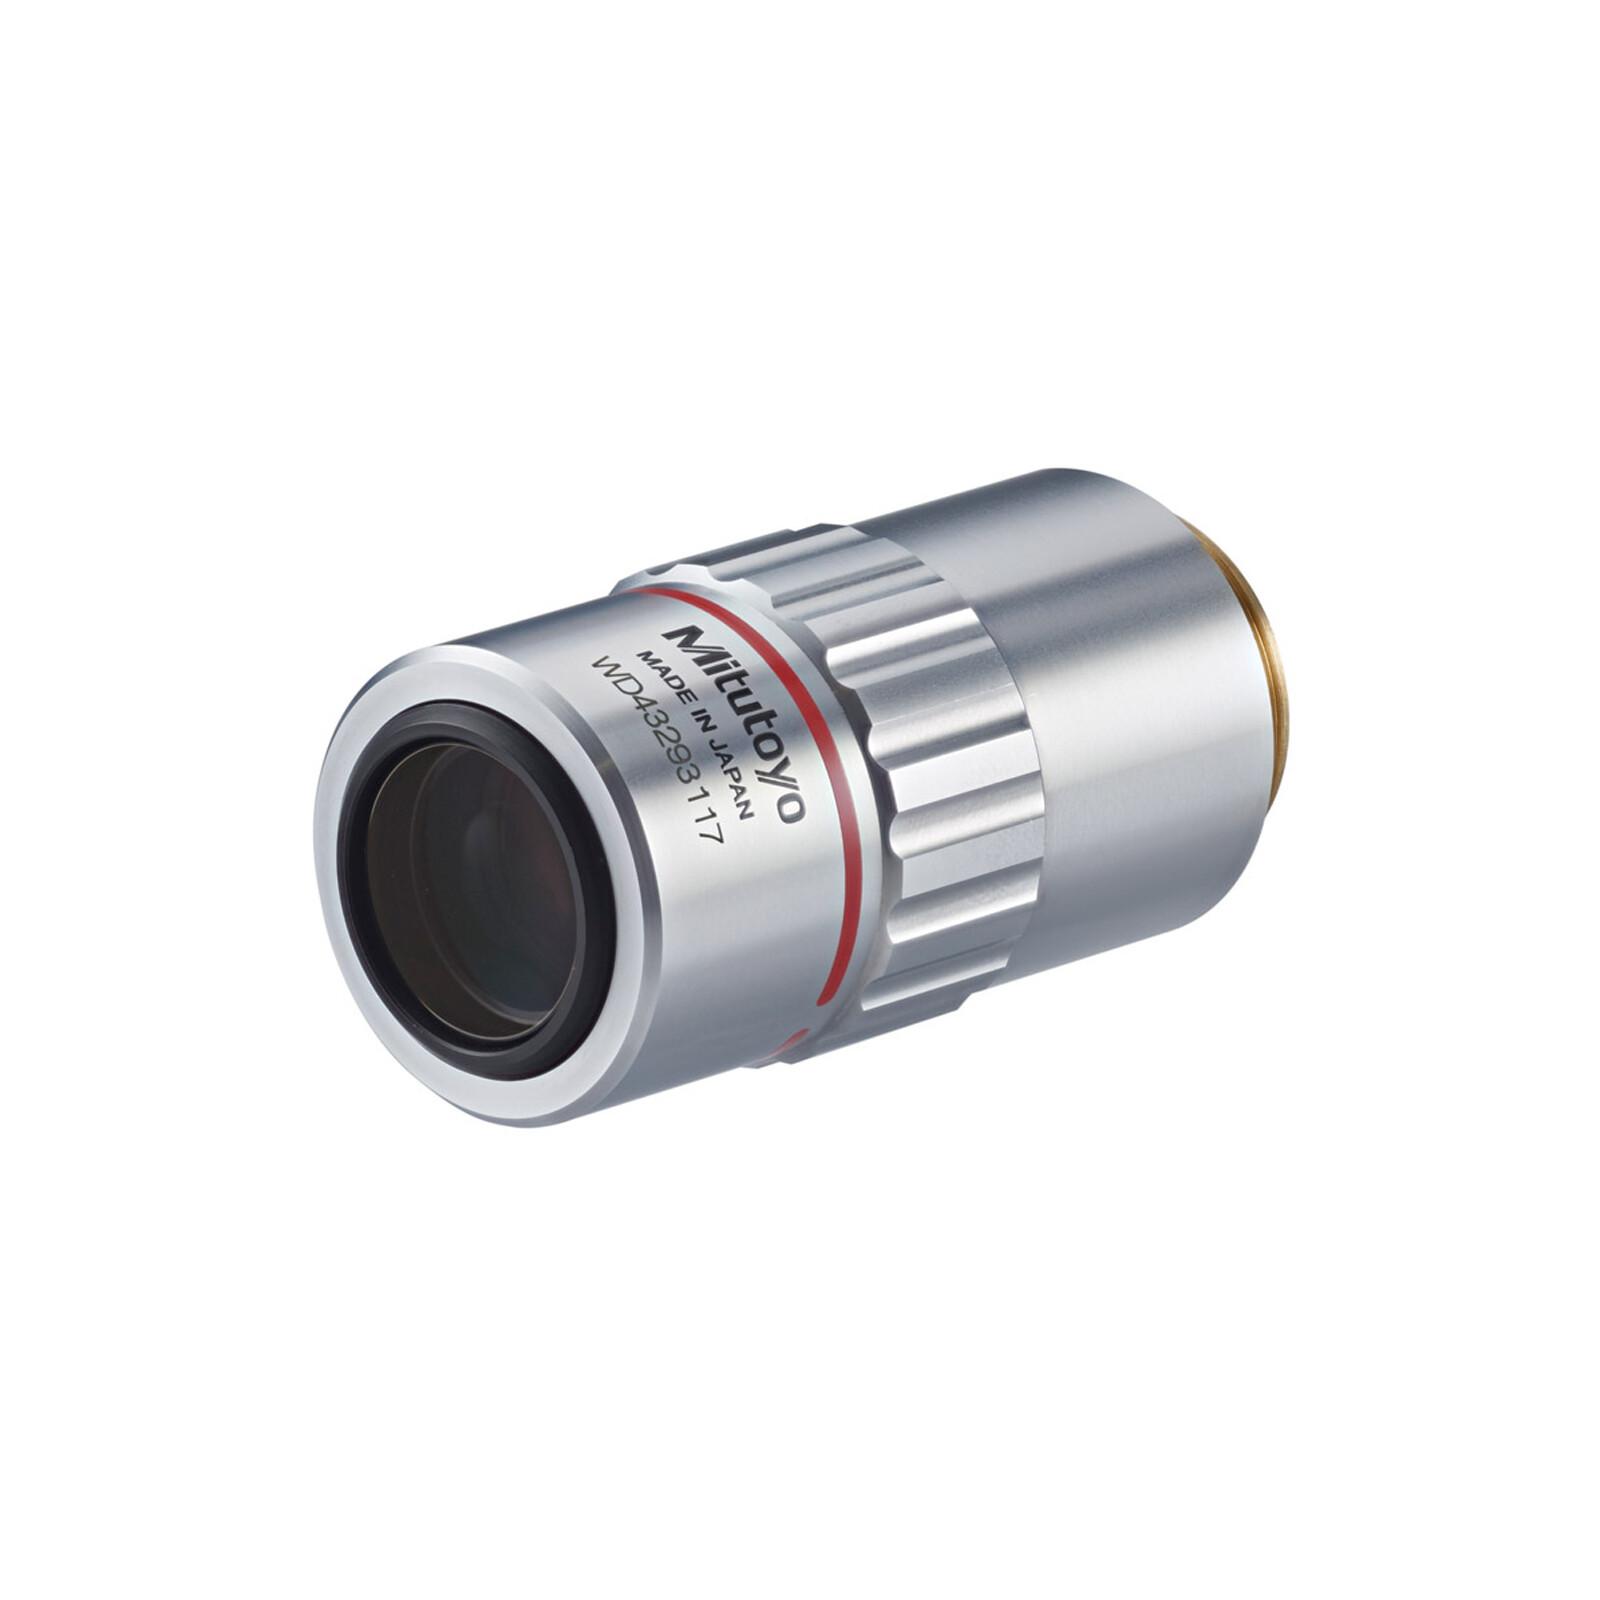 Novoflex MPLAN-A10 10x Mikroskopobjektiv